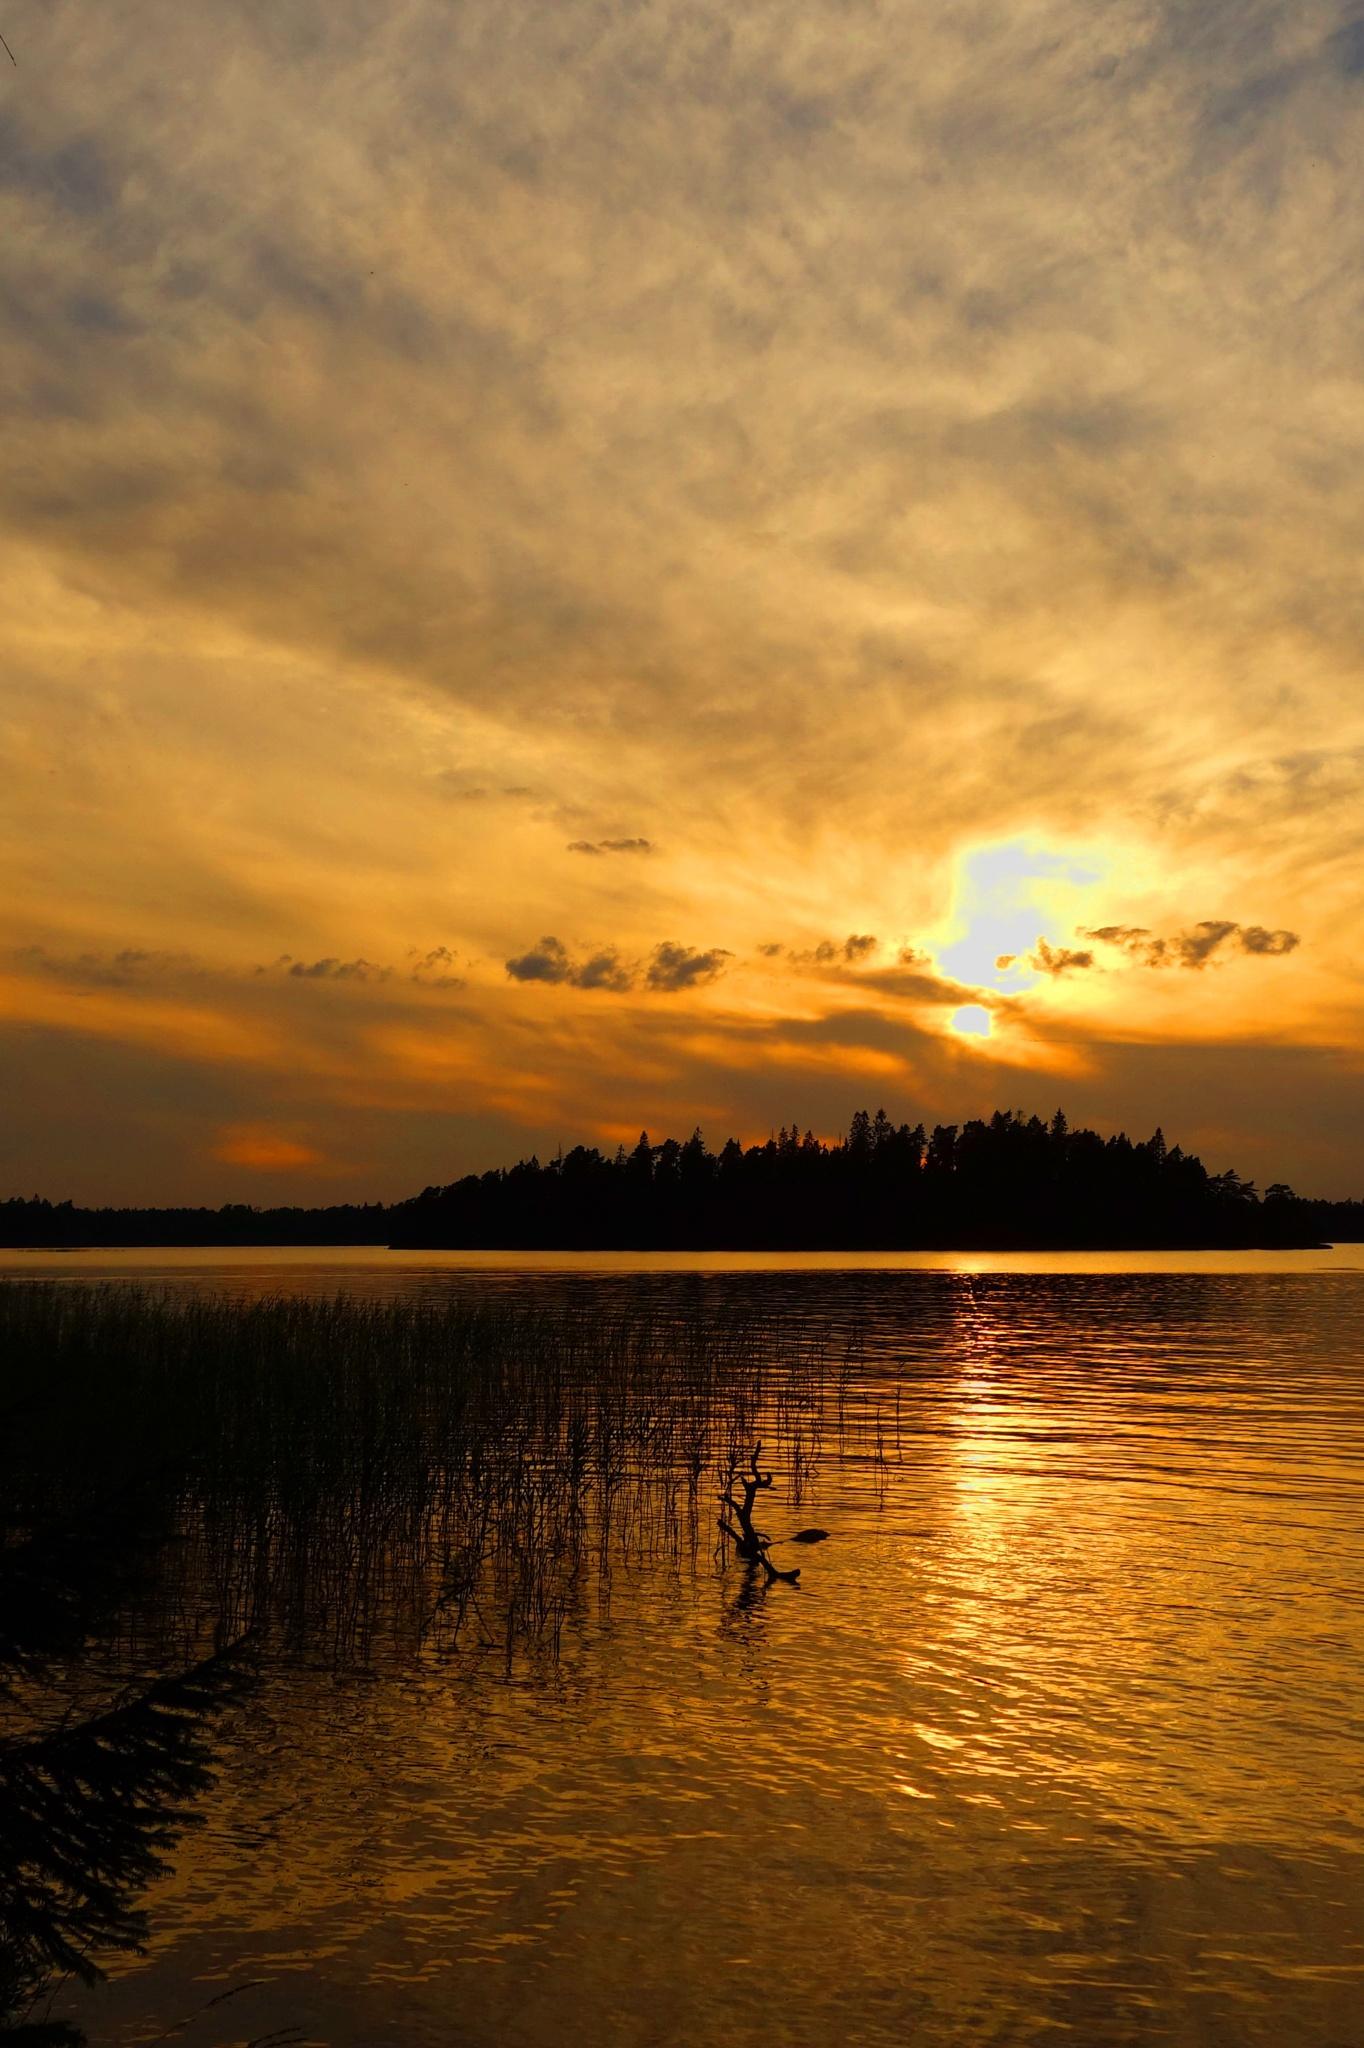 Sunset by Ad Spruijt